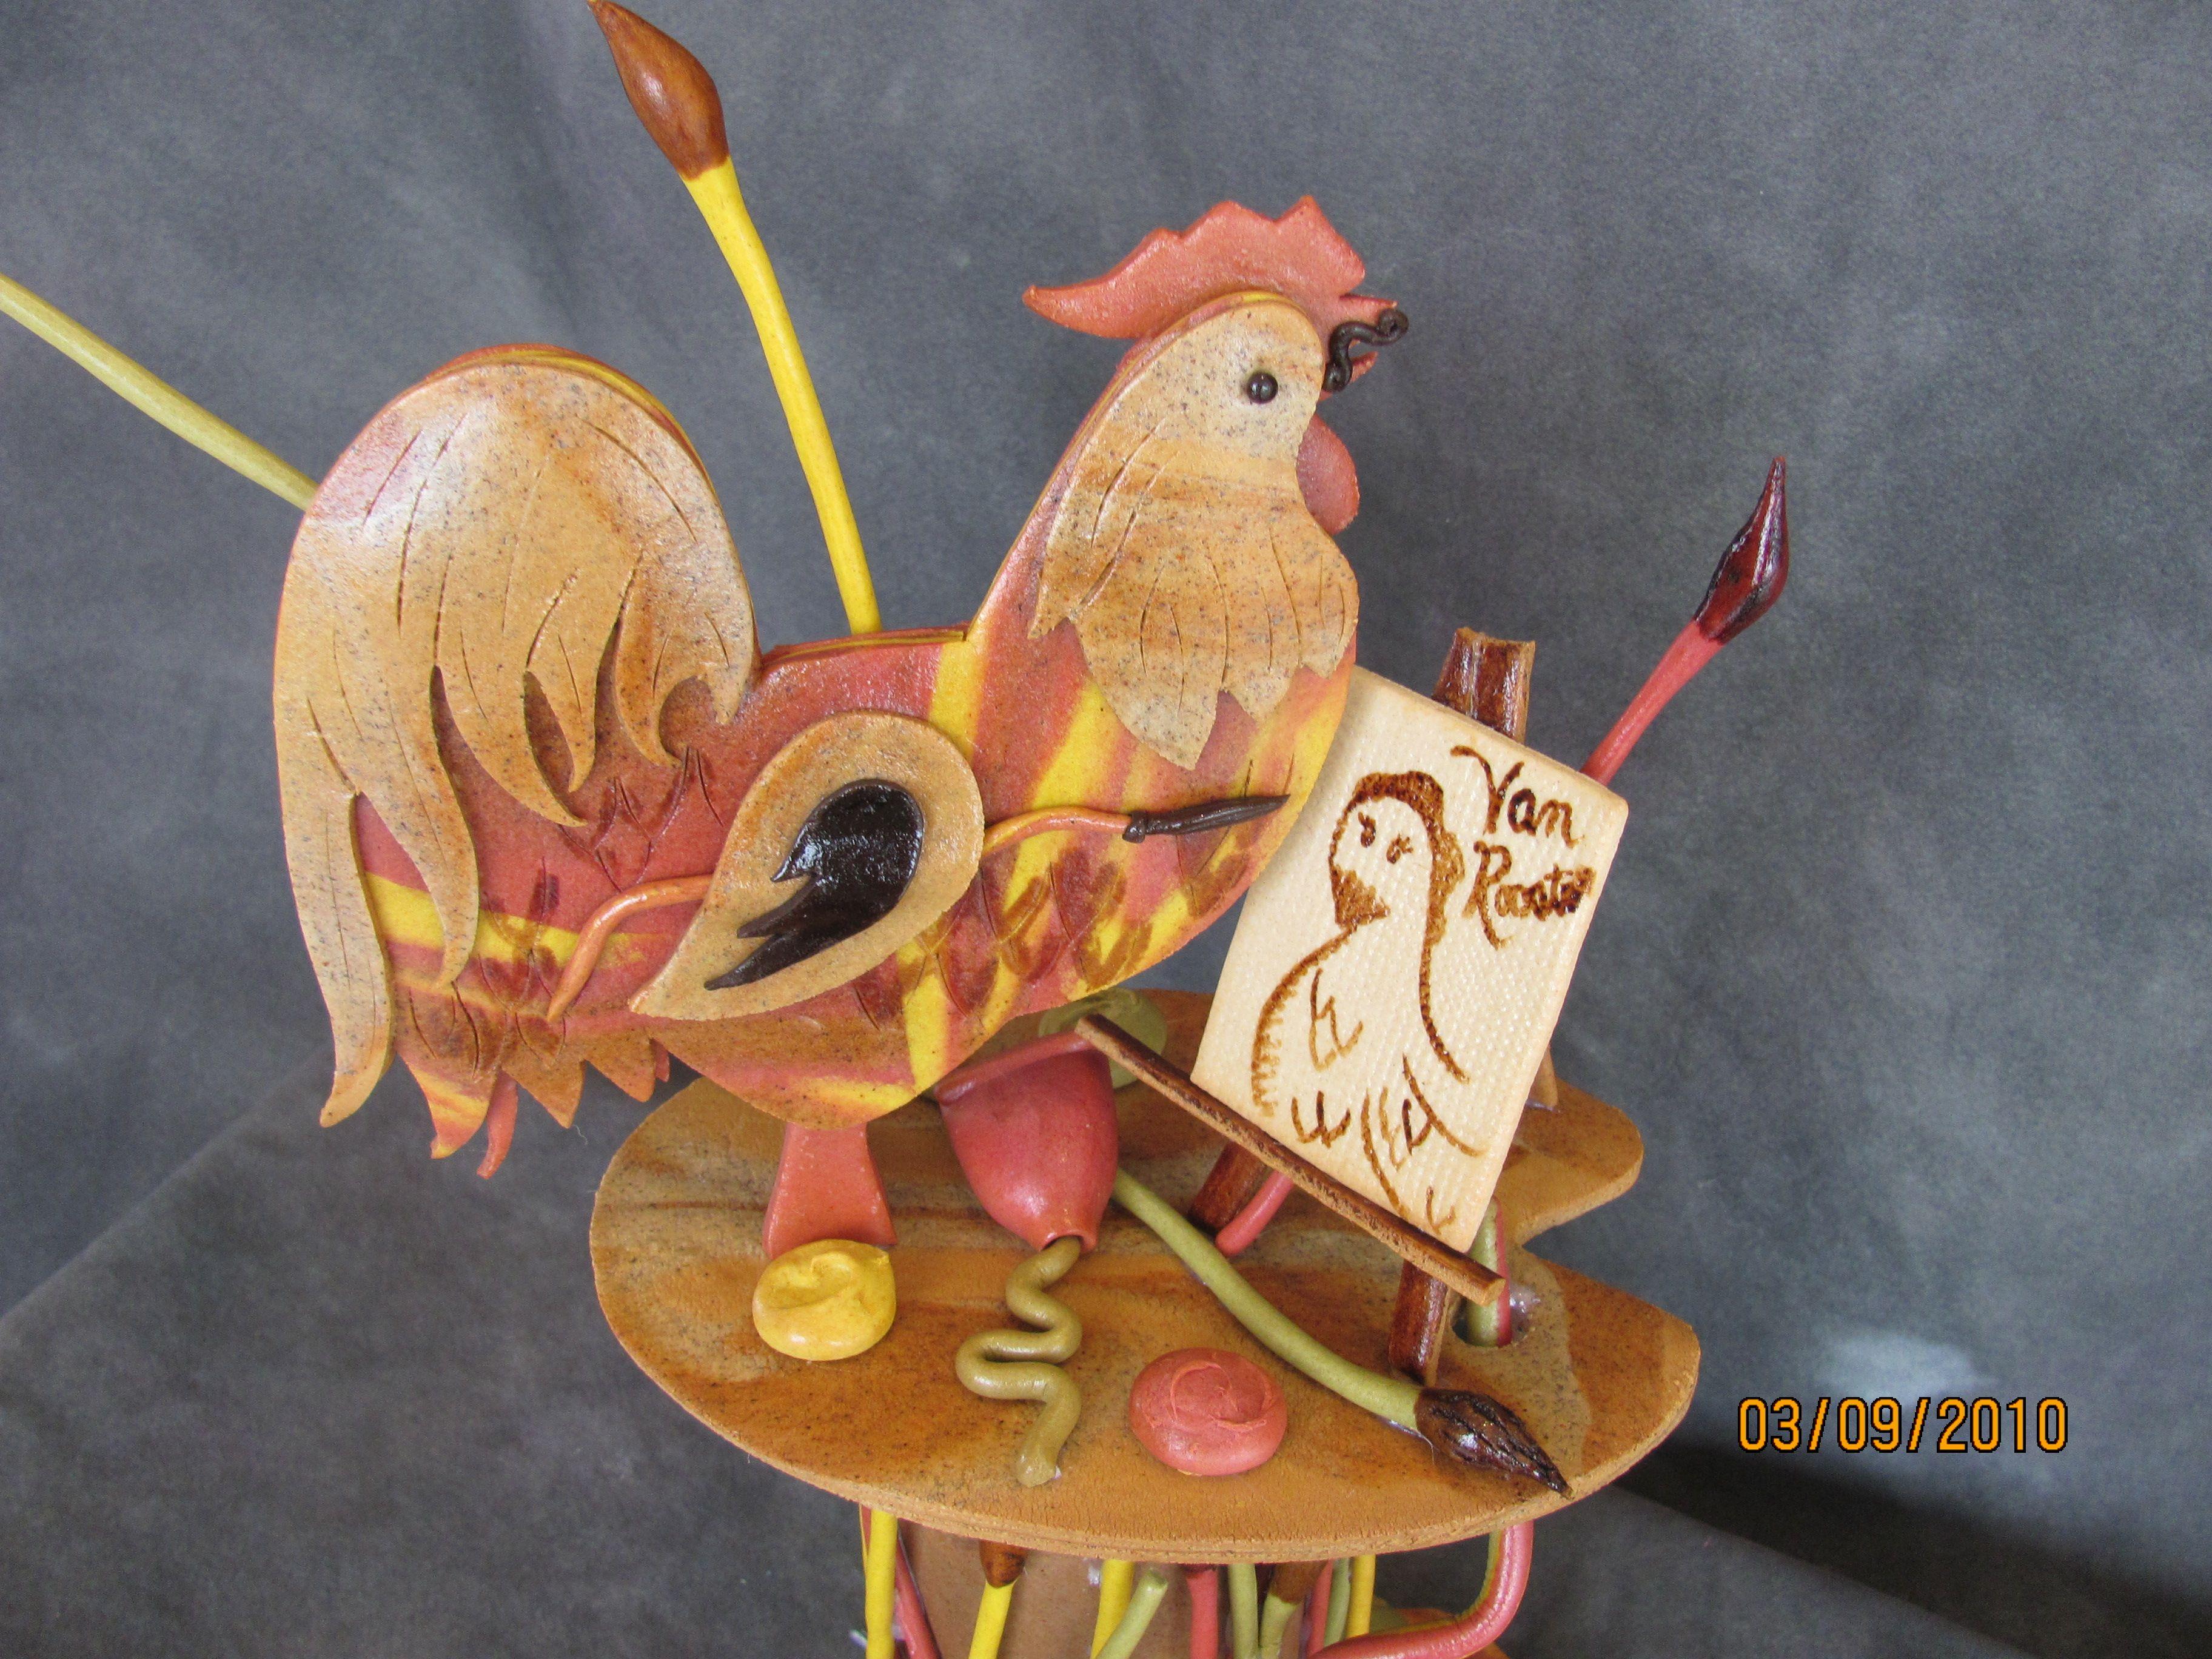 Dead dough rooster showpiece